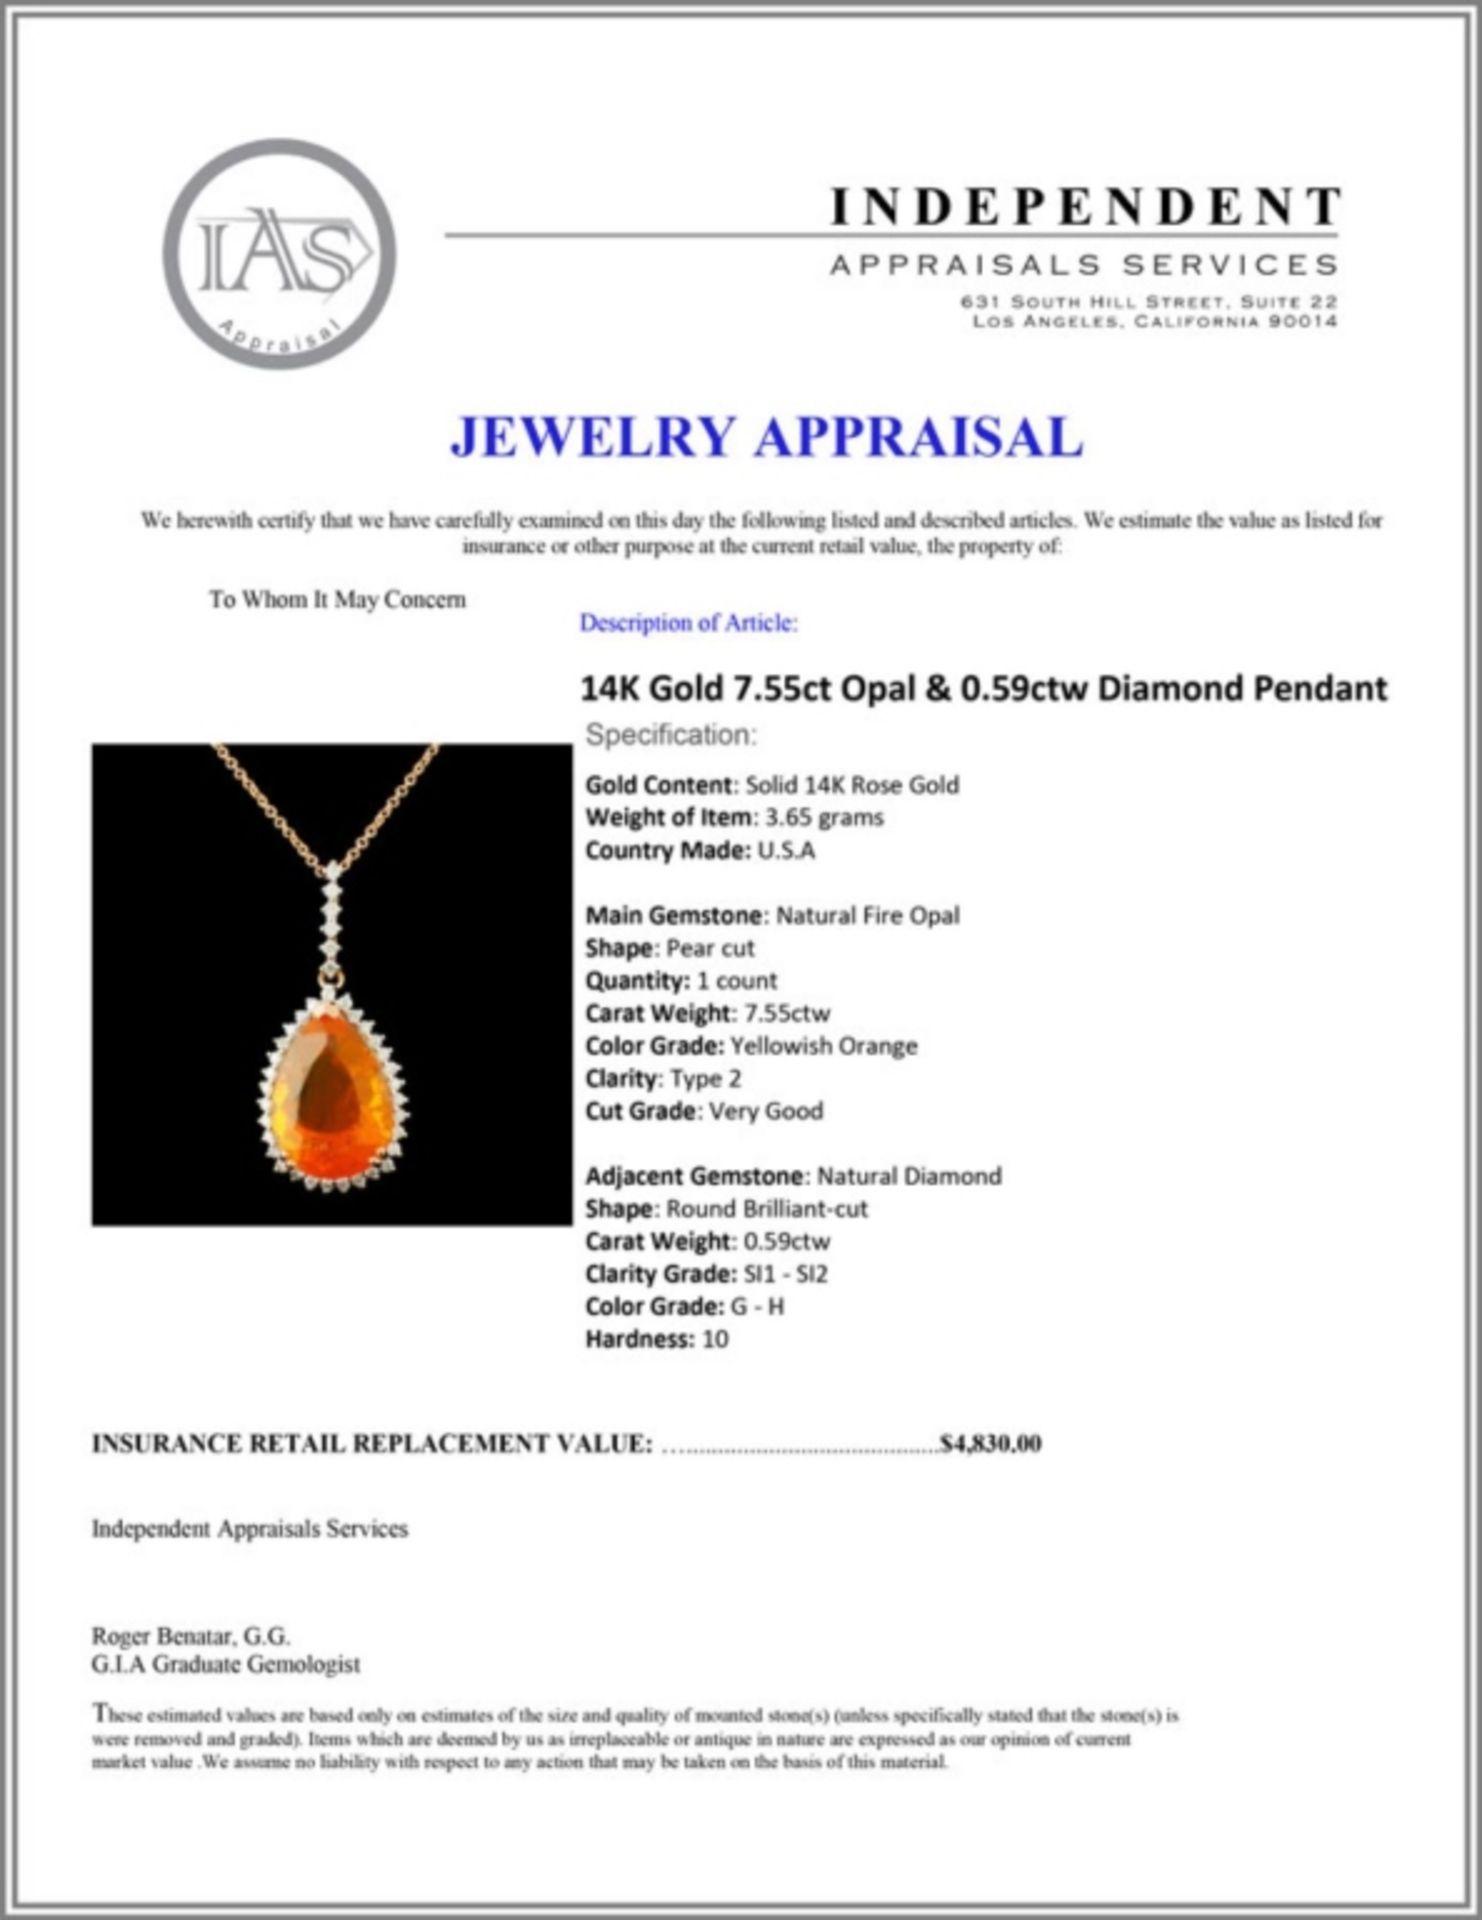 14K Gold 7.55ct Opal & 0.59ctw Diamond Pendant - Image 4 of 4